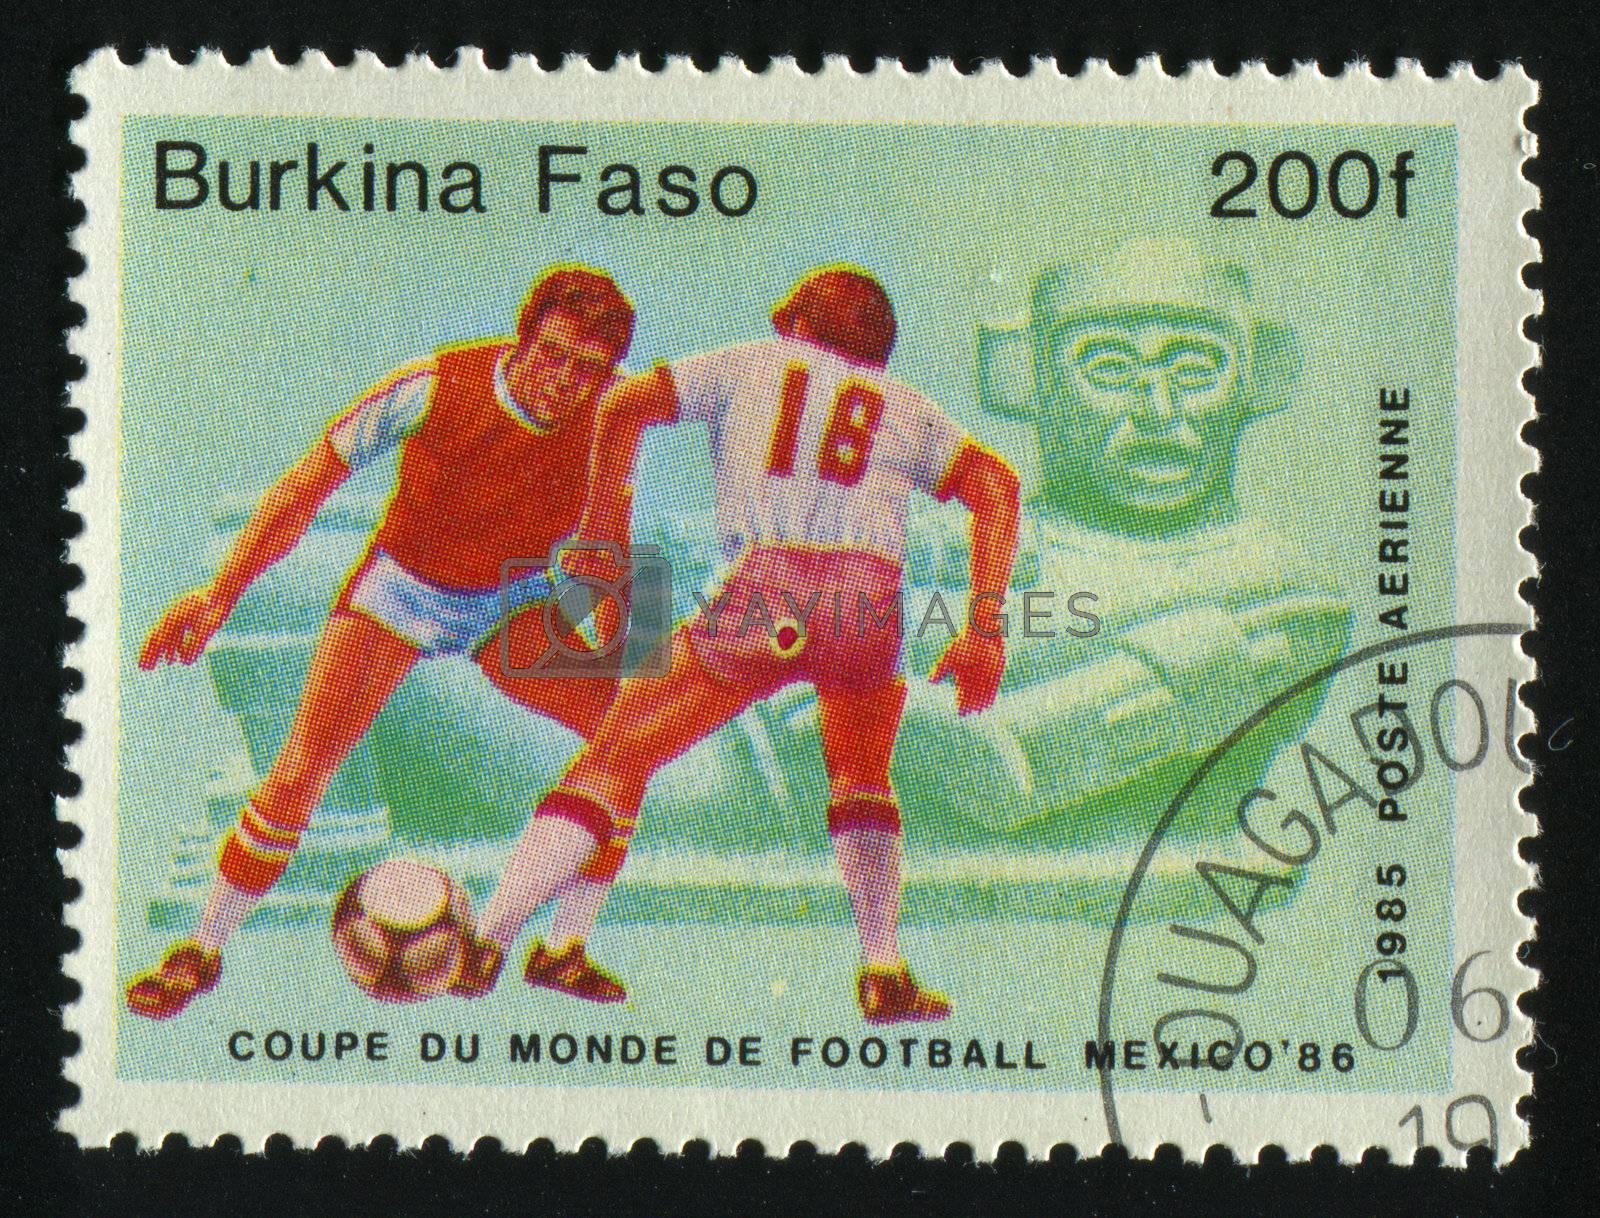 BURKINA FASO - CIRCA 1986: stamp printed by Burkina Faso, shows soccer players and ball. Championships Mexico, circa 1986.